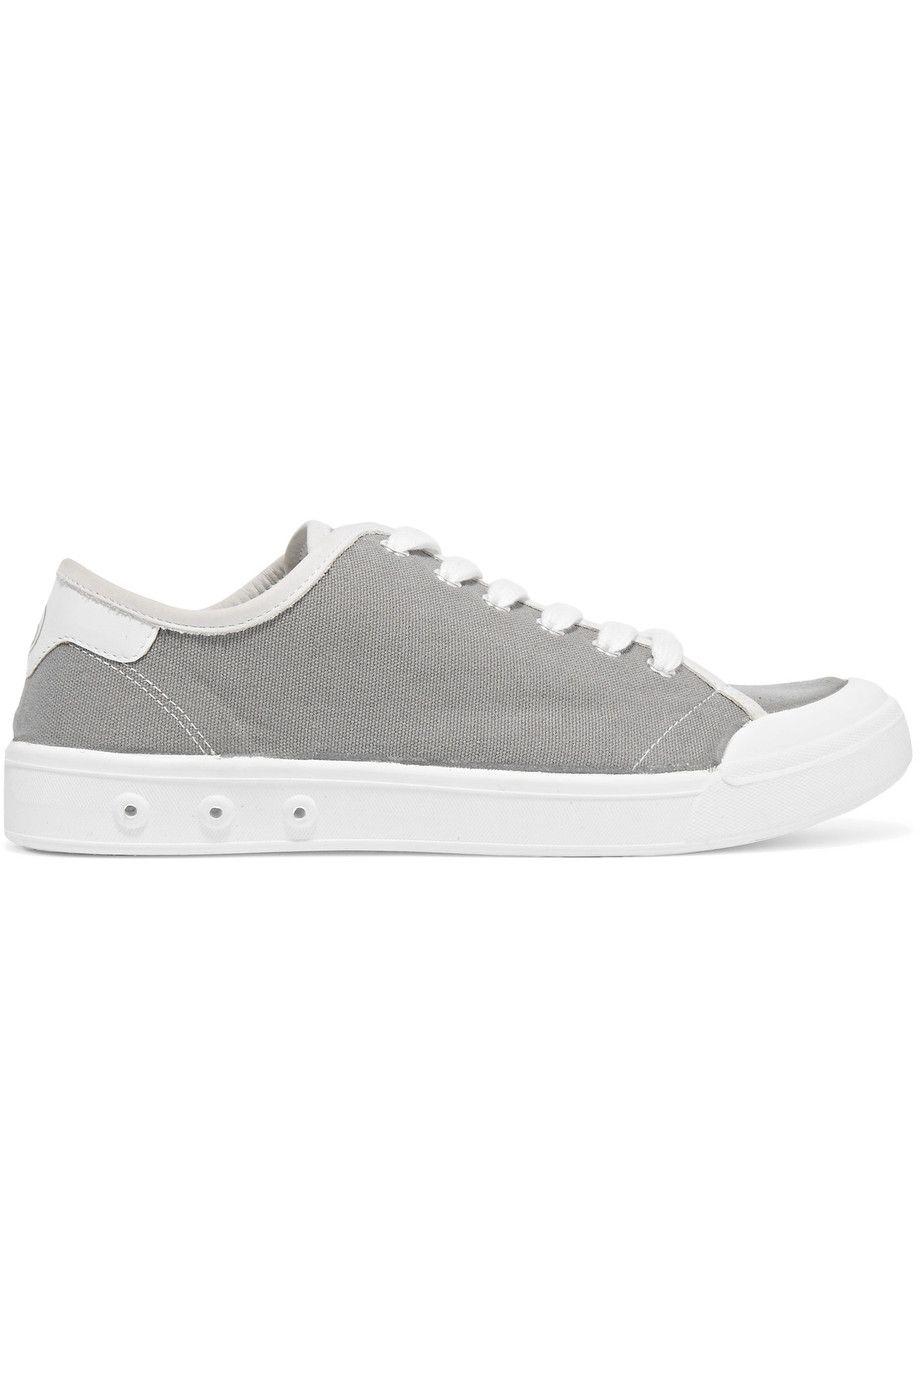 Rag & Bone Woman Standard Issue Leather-trimmed Canvas High-top Sneakers White Size 37.5 Rag & Bone ISQZOzwm1o